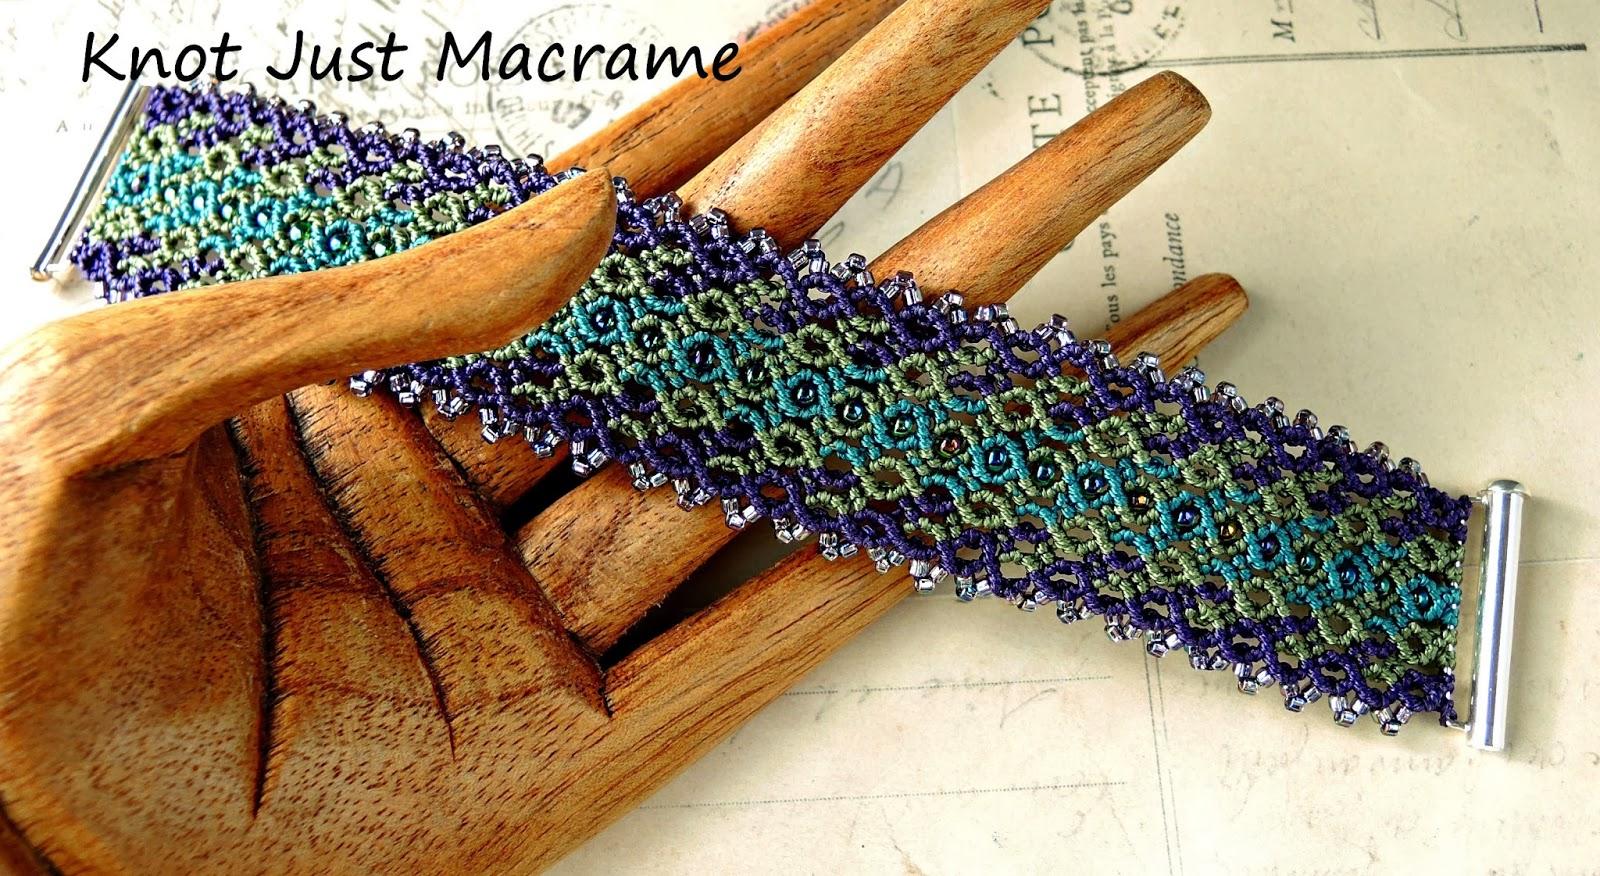 Micro macrame bracelet by Sherri Stokey of Knot Just Macrame